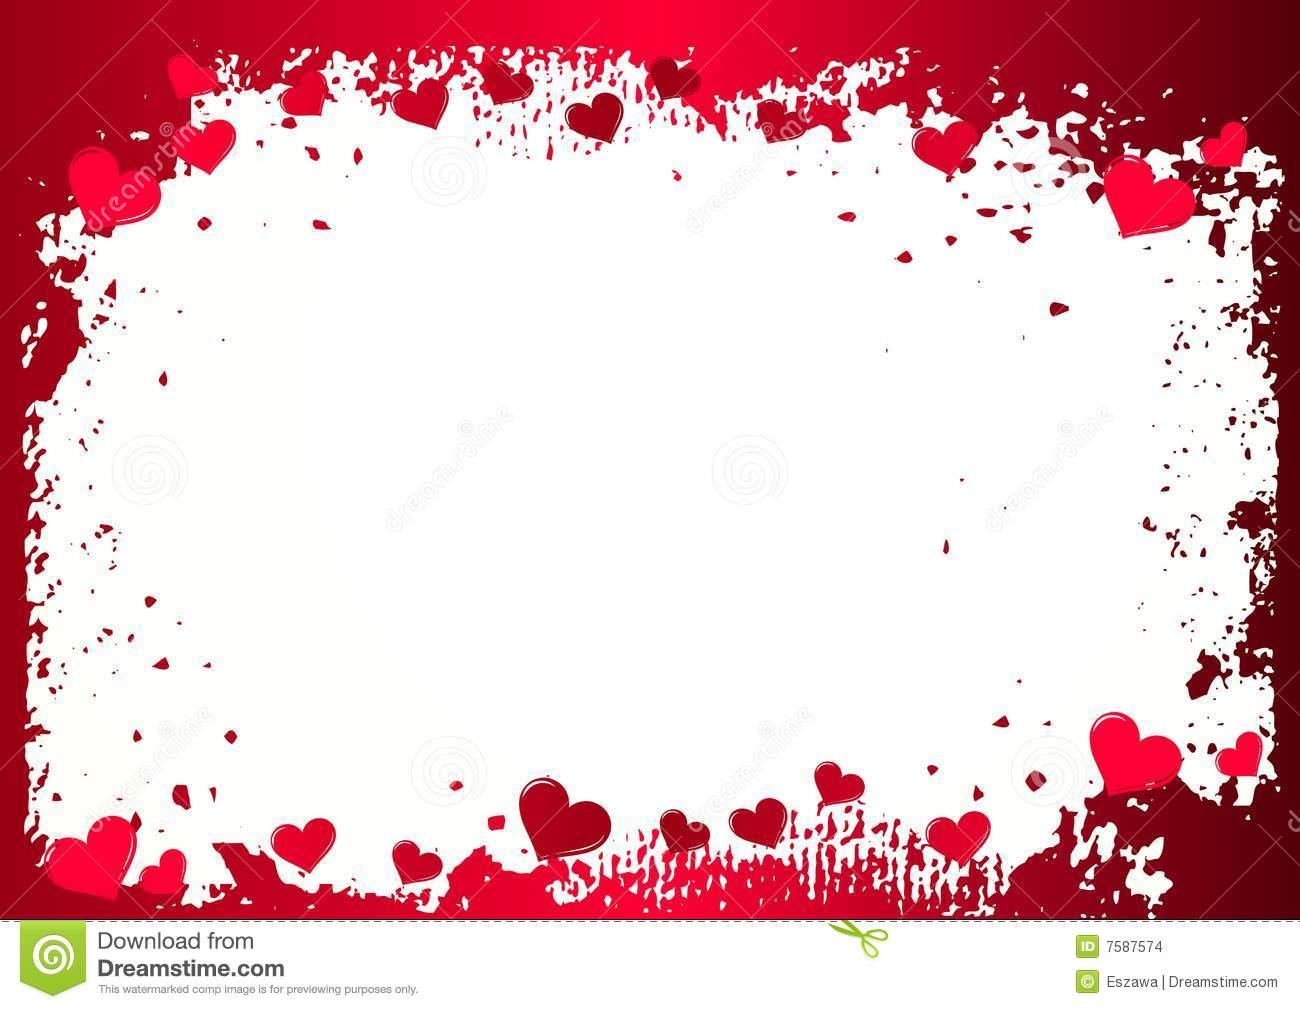 Free Download Valentine Background Image Wallpaper 12409